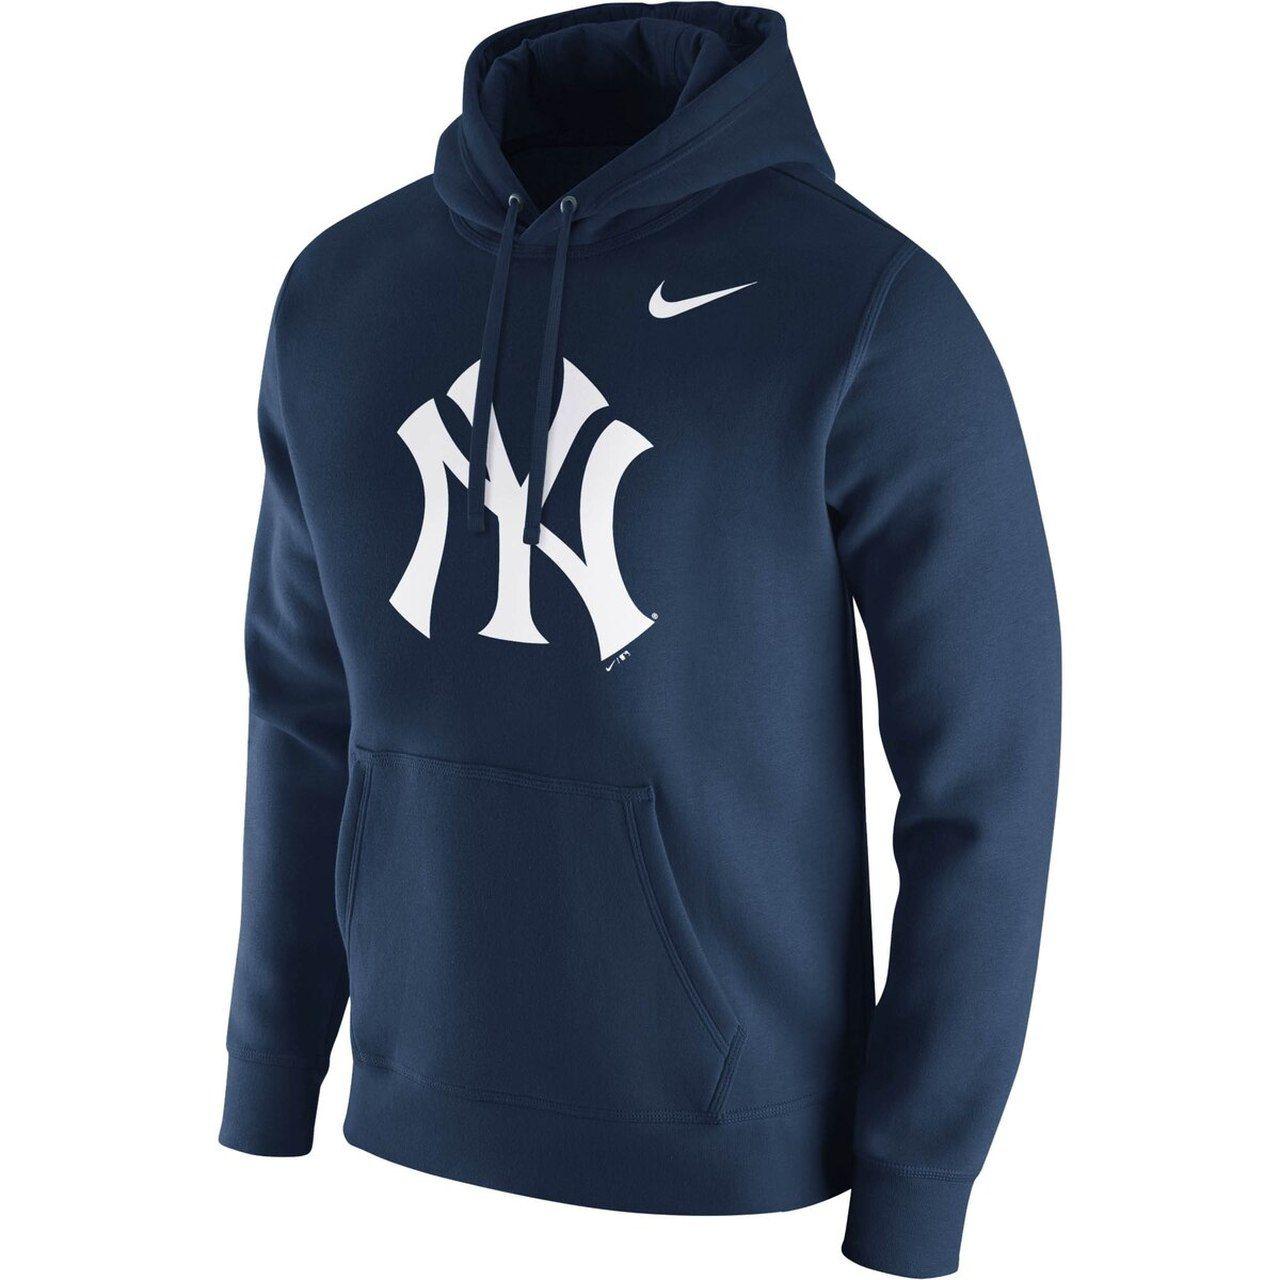 Official New York Yankees Hoodie New York Yankees Apparel Hoodies Men New York Yankees [ 1024 x 1024 Pixel ]